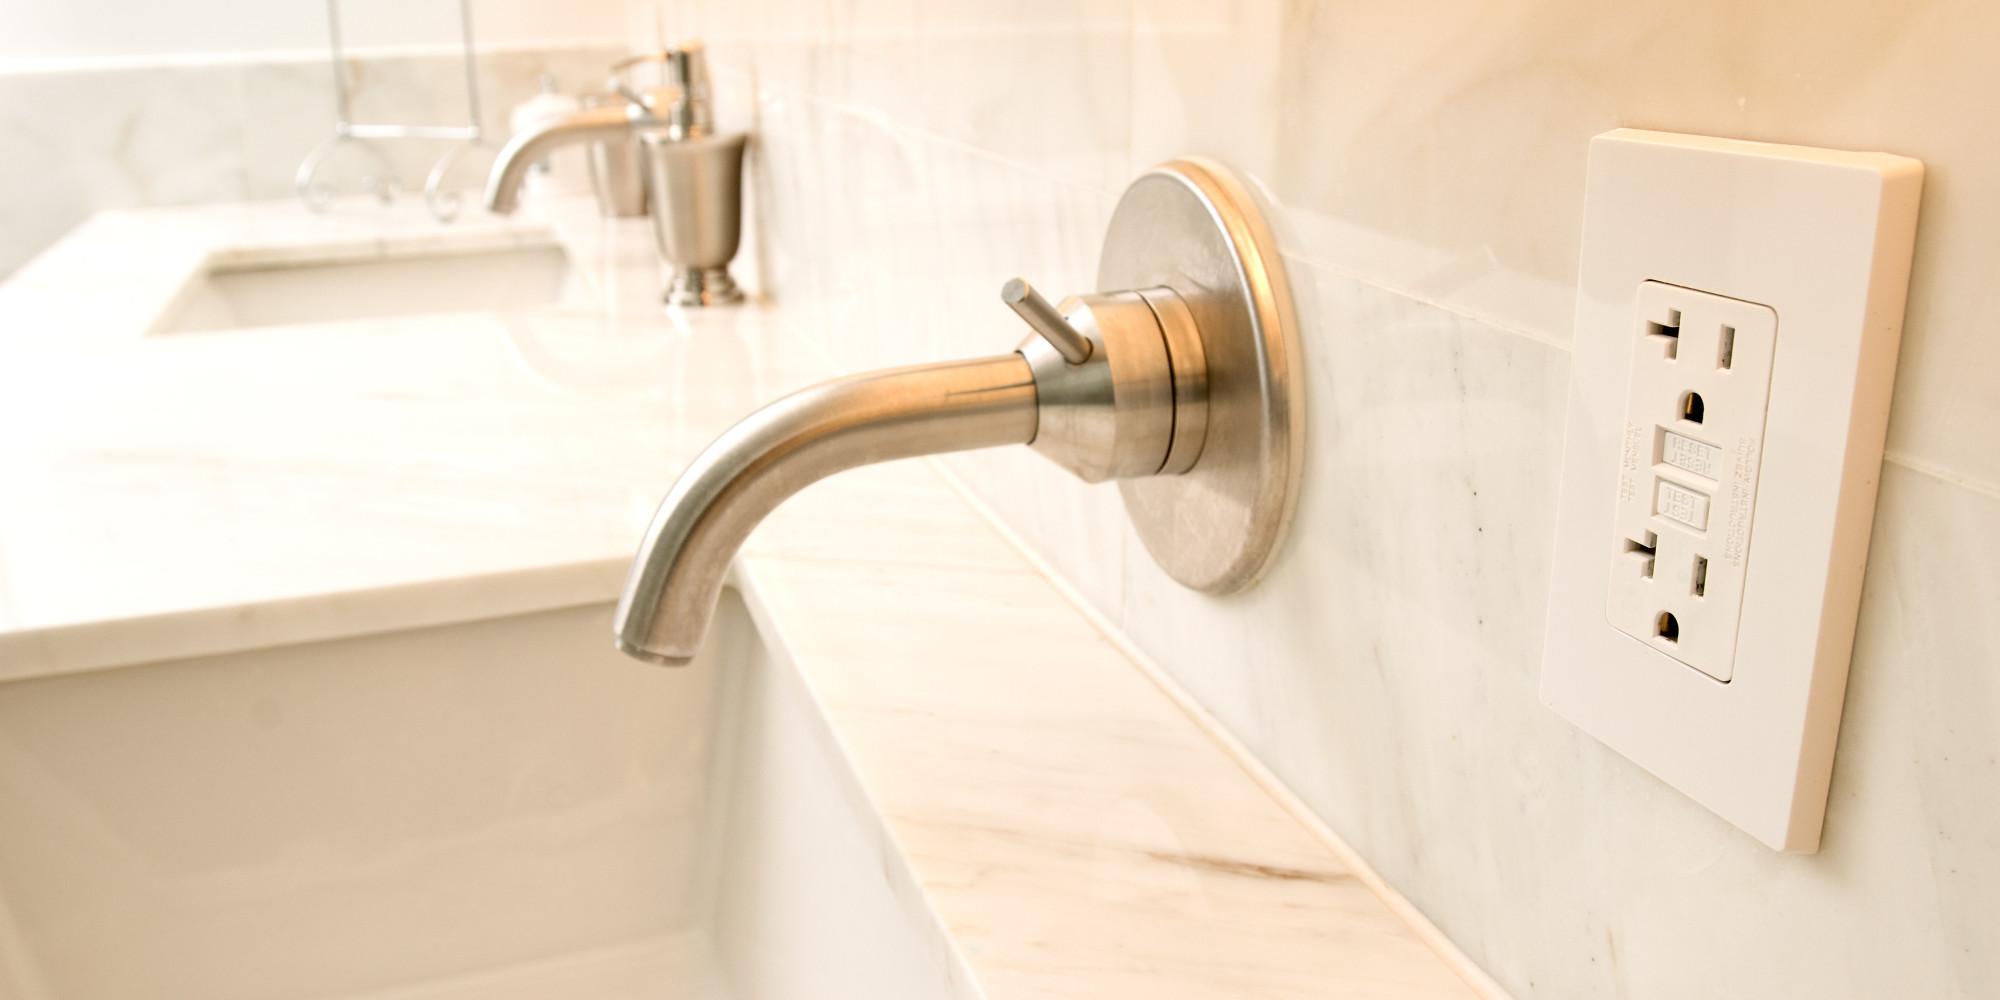 Small Spy Cameras For Bathrooms My Web Value